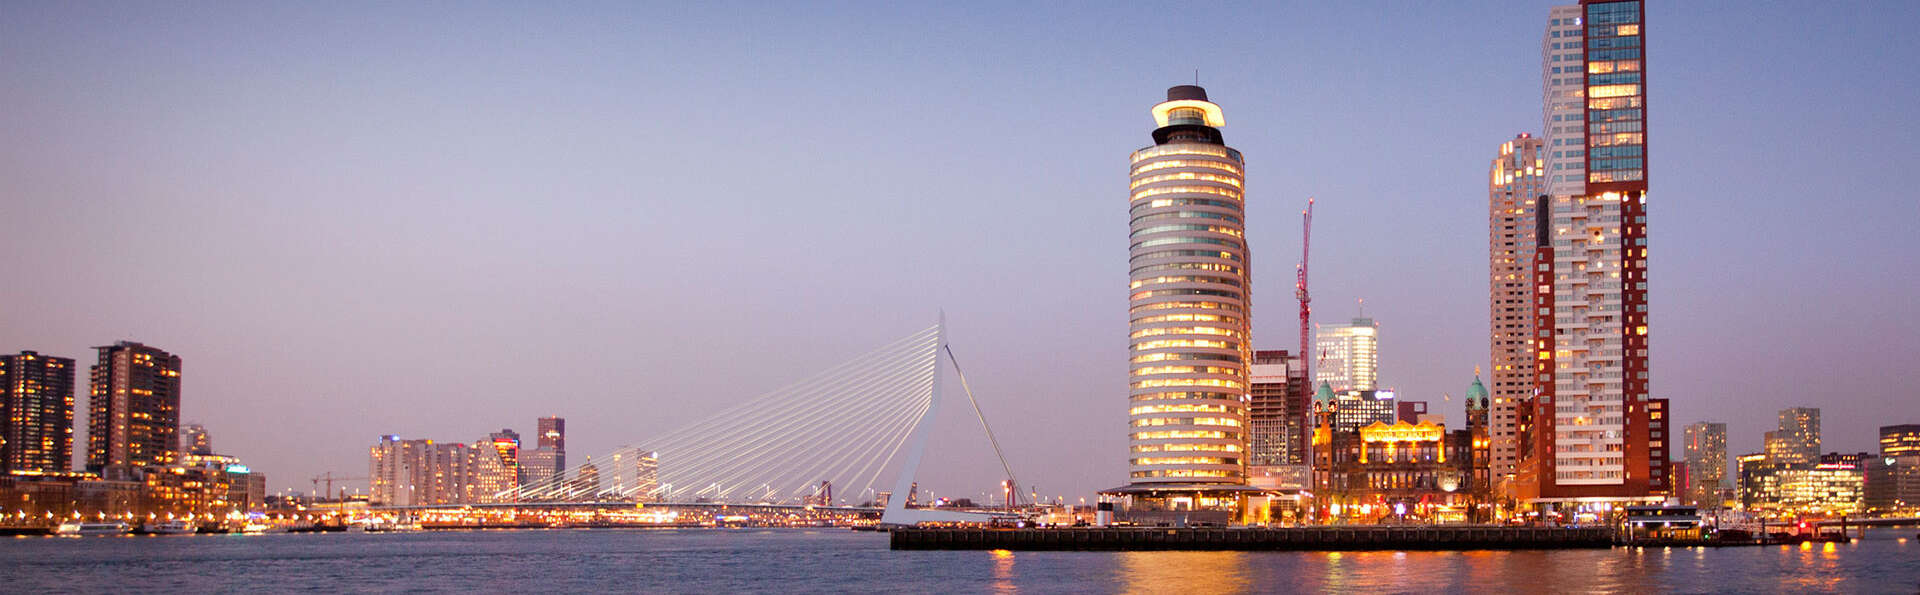 ss Rotterdam Hotel and Restaurants - EDIT_destination2.jpg